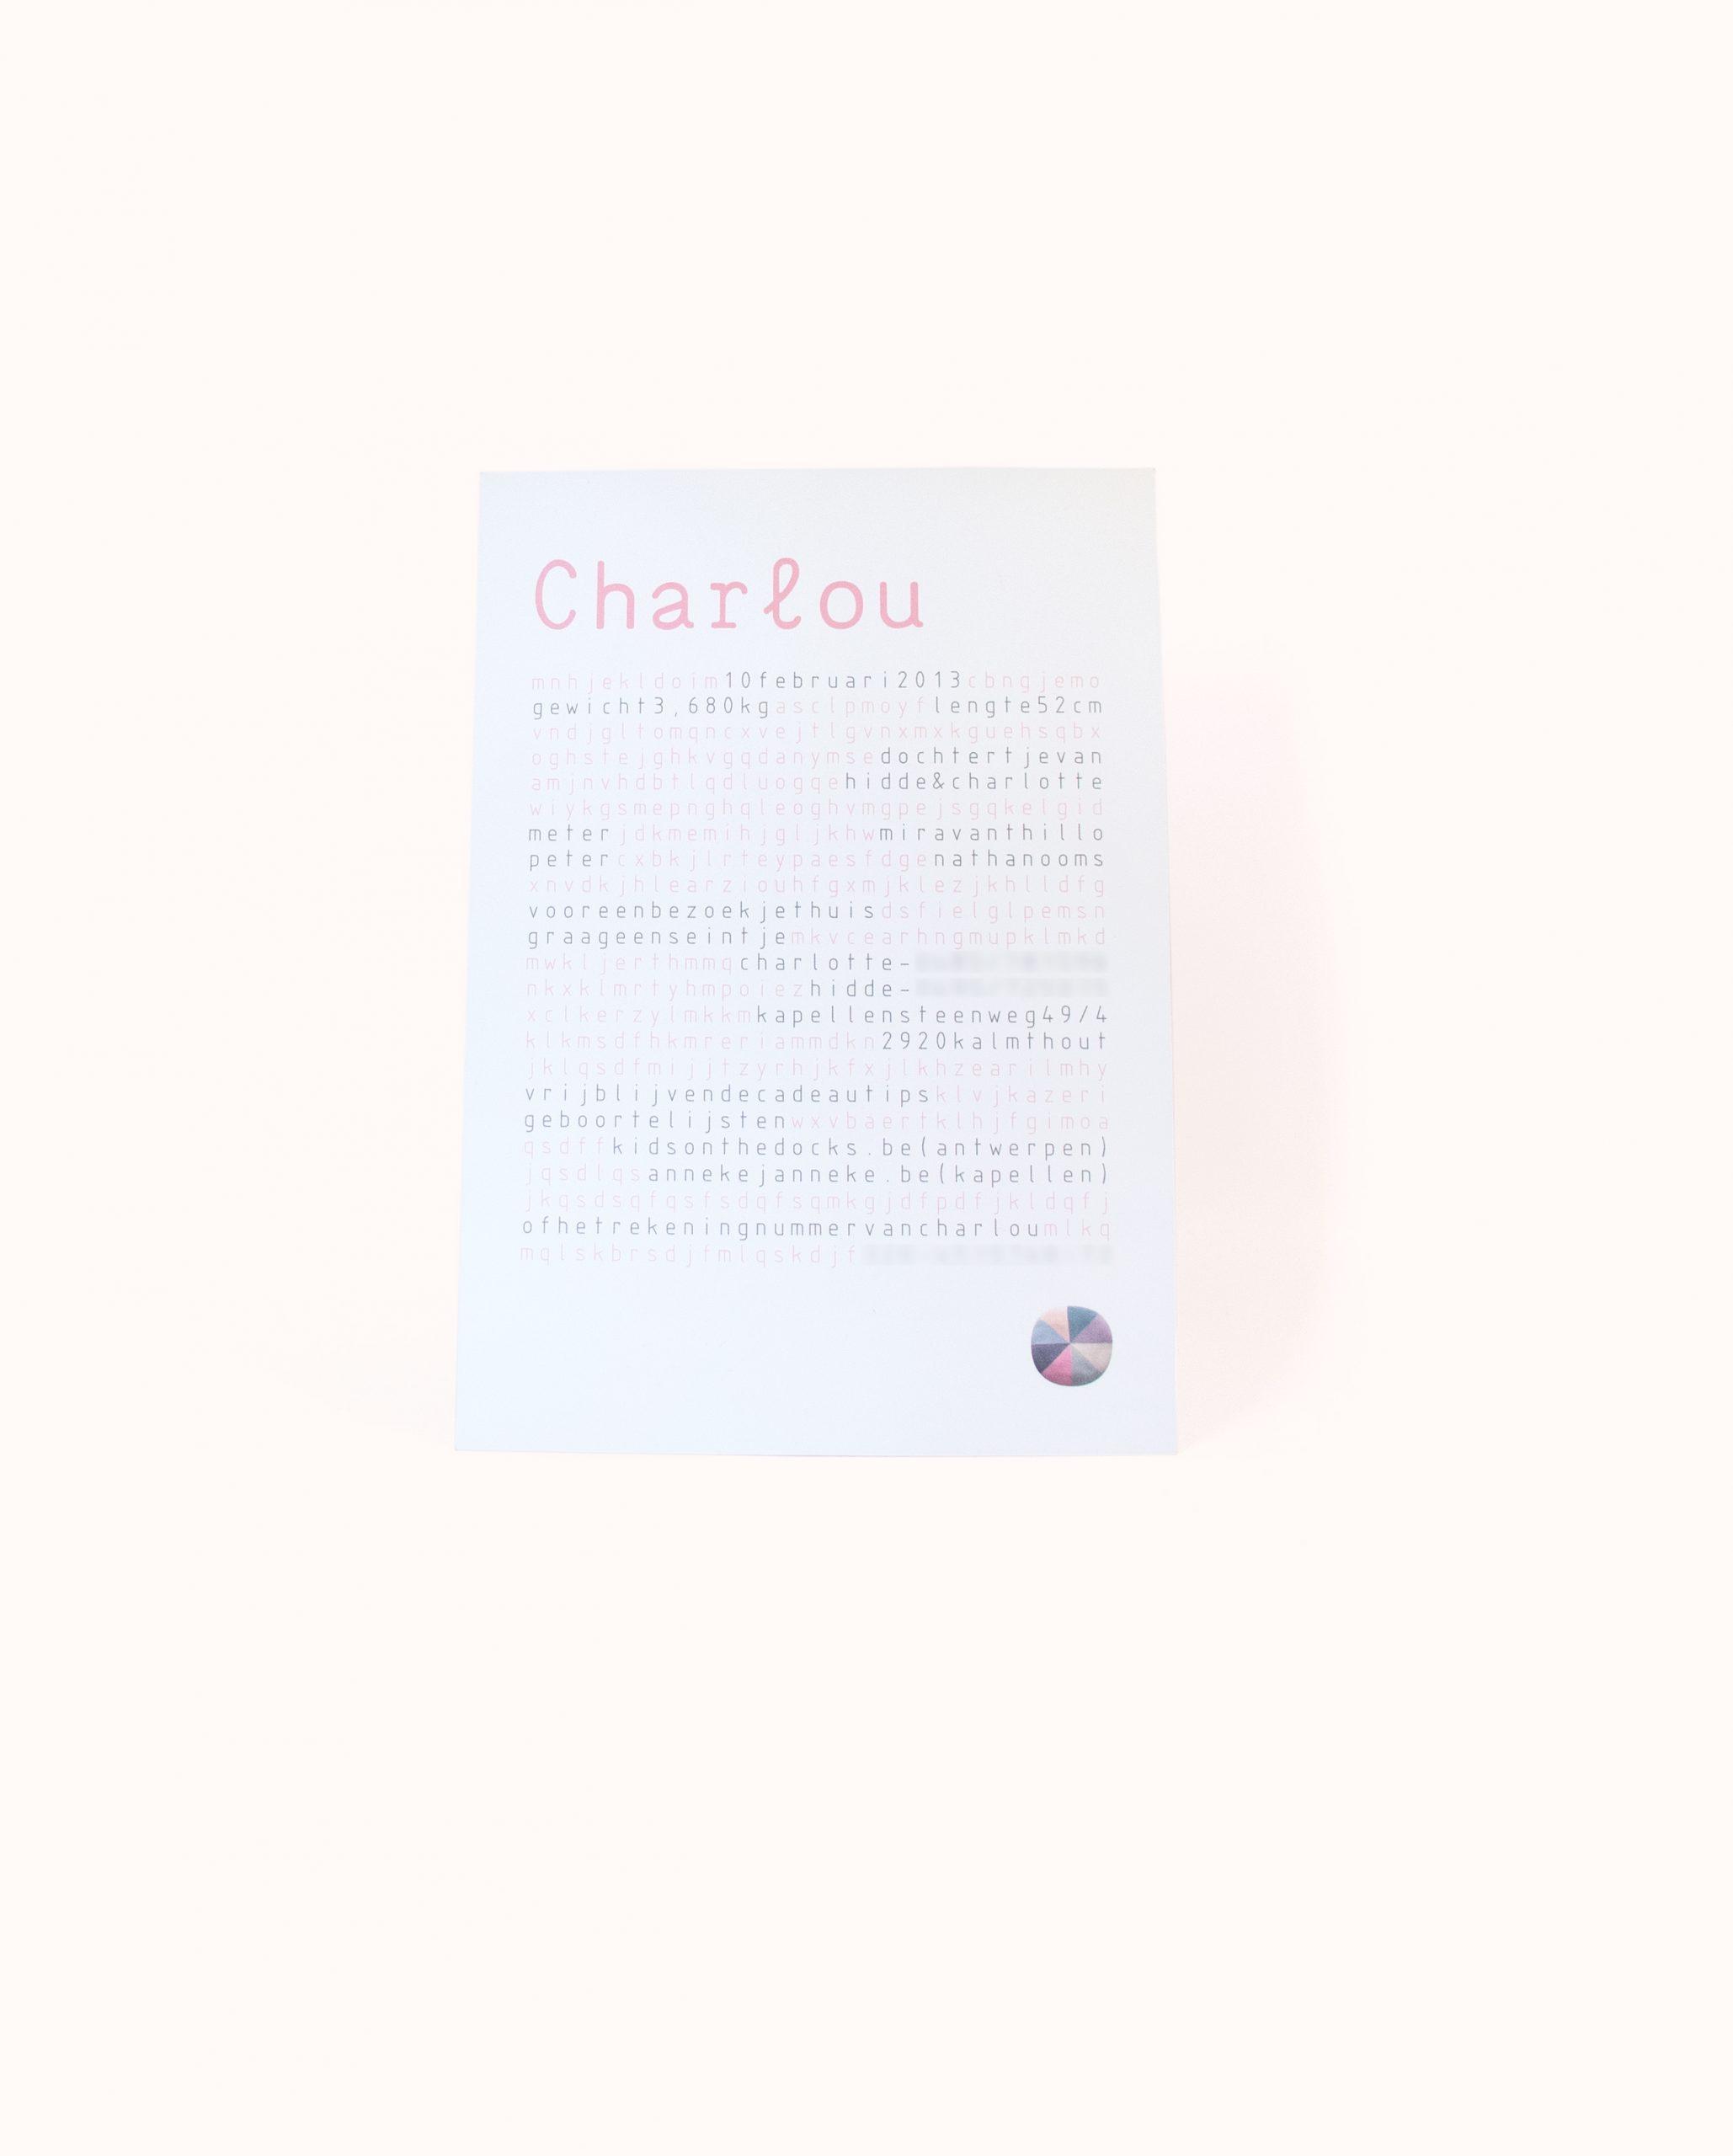 Charlou_3